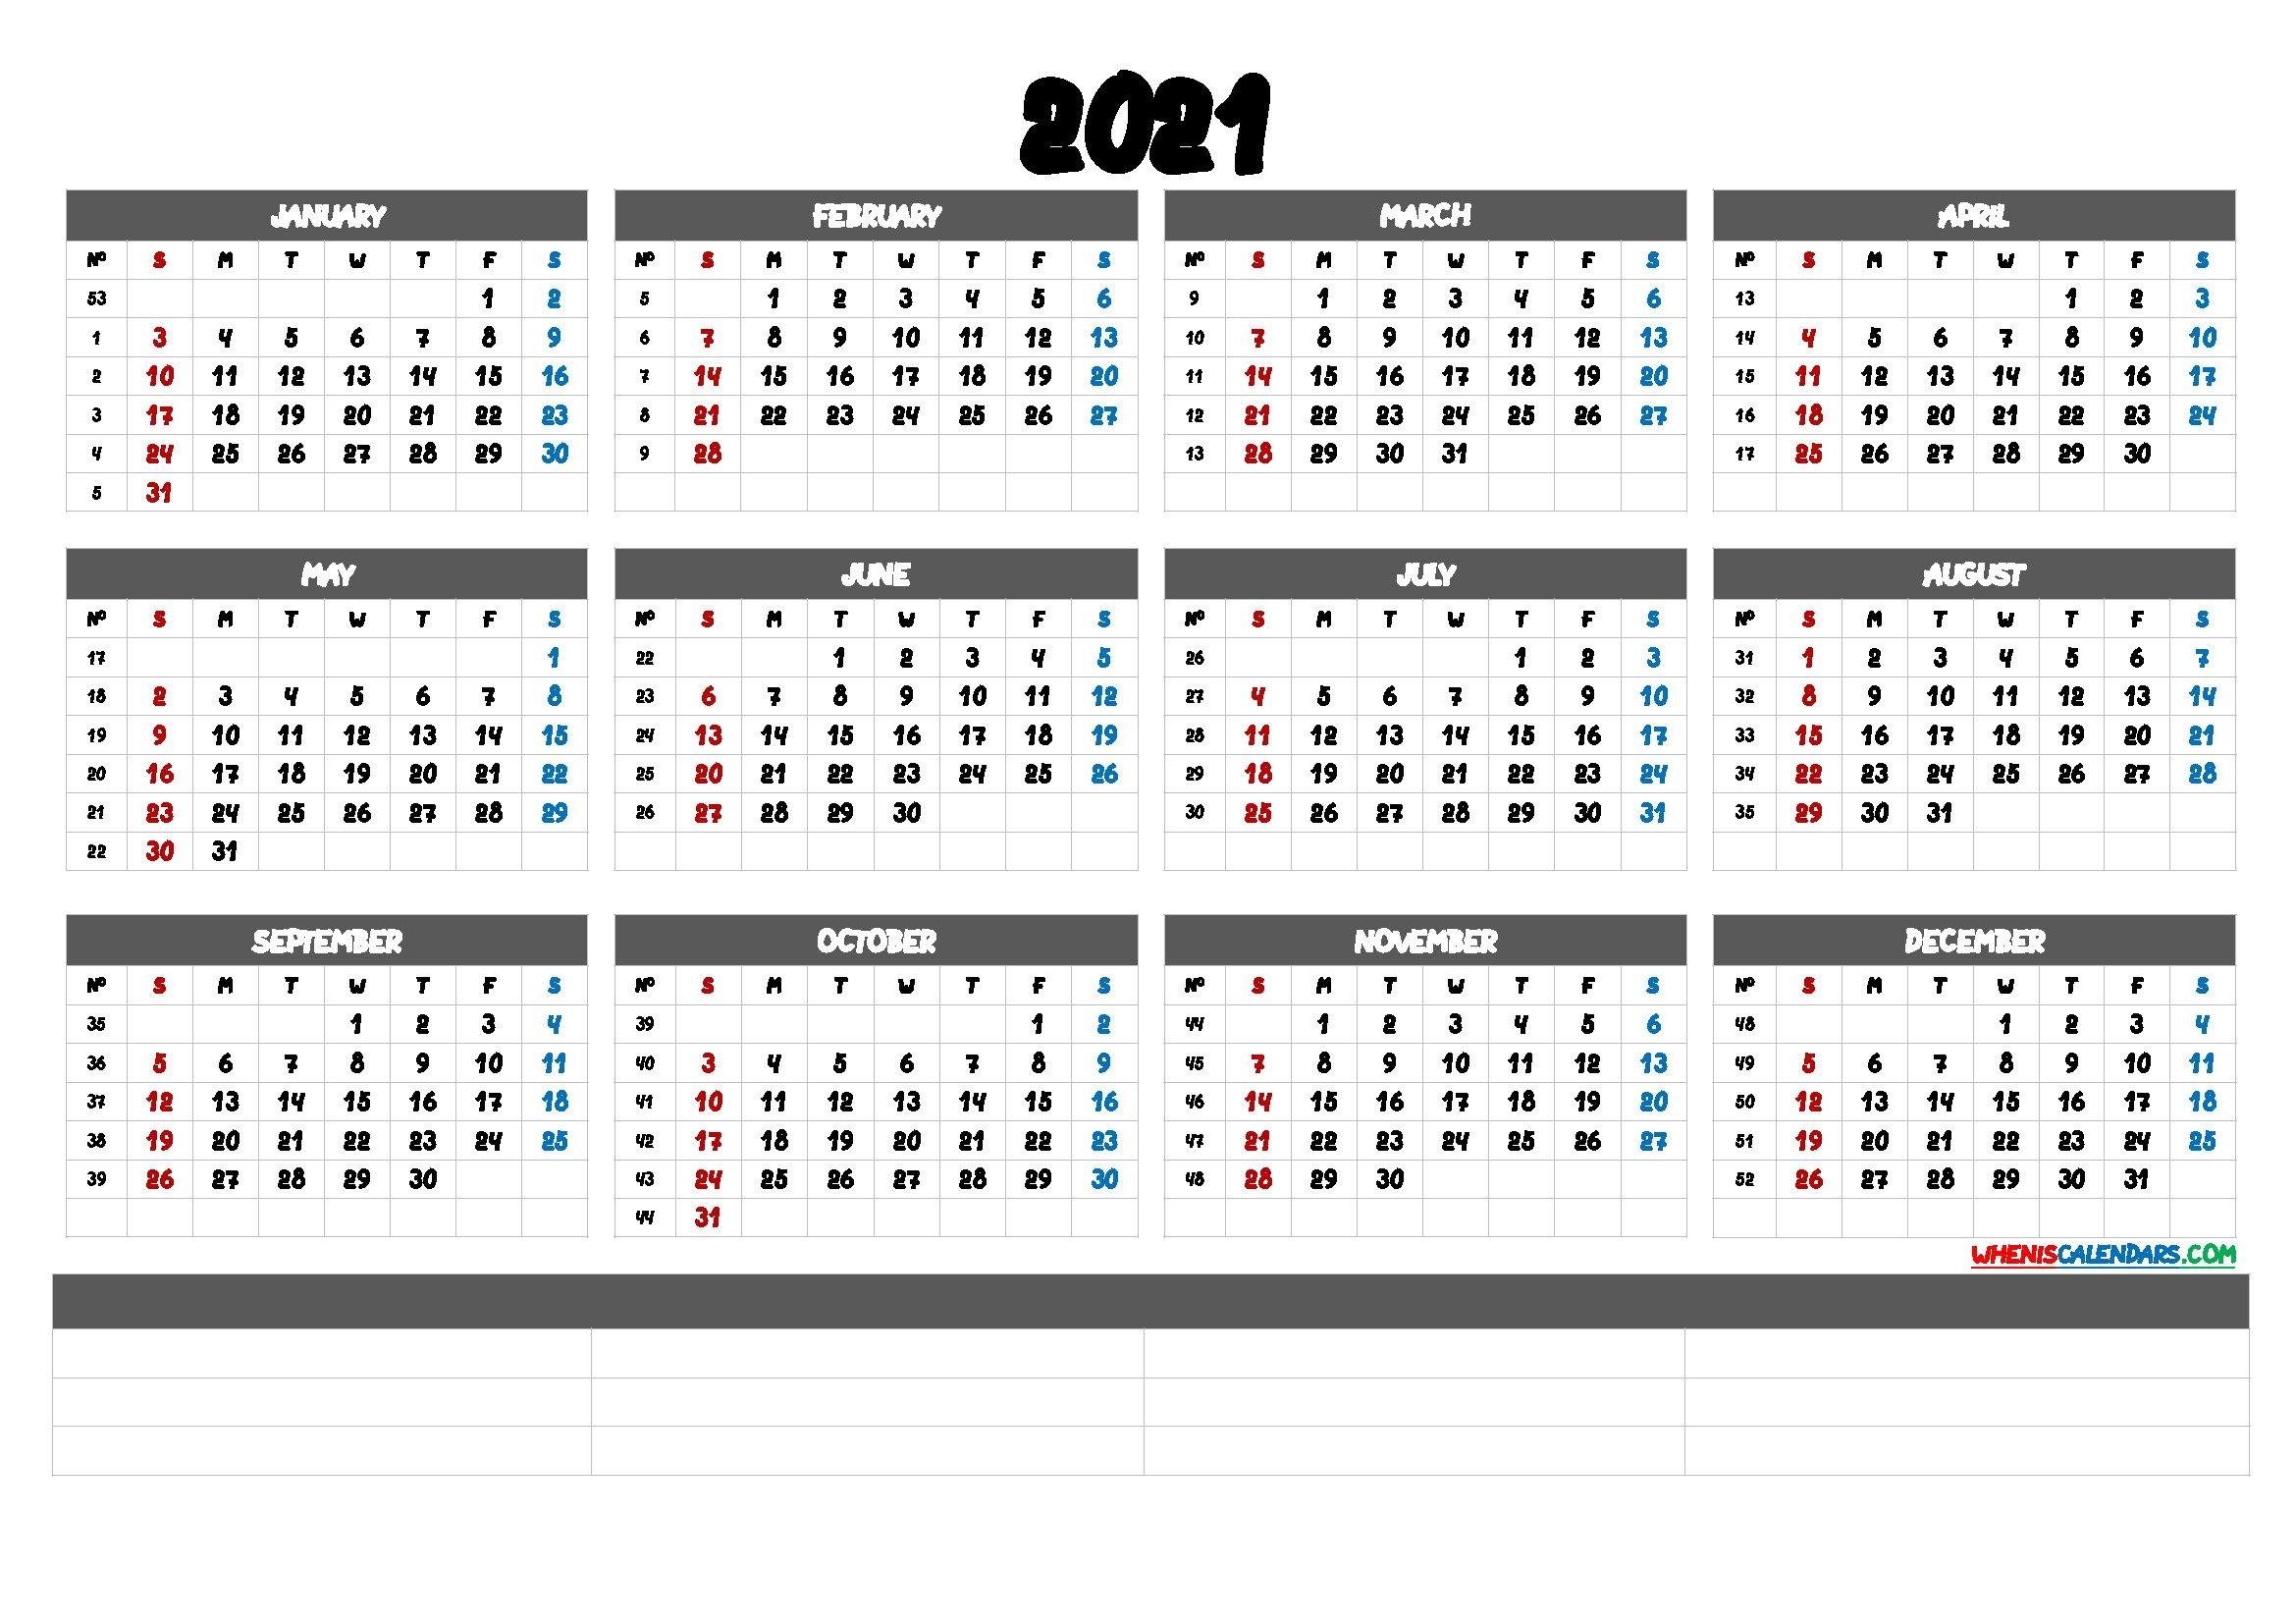 2021 Calendar With Week Number Printable Free : Calendar 2021, Week Starts On Monday Stock with regard to 2021 Printable Monthly Calendar Image